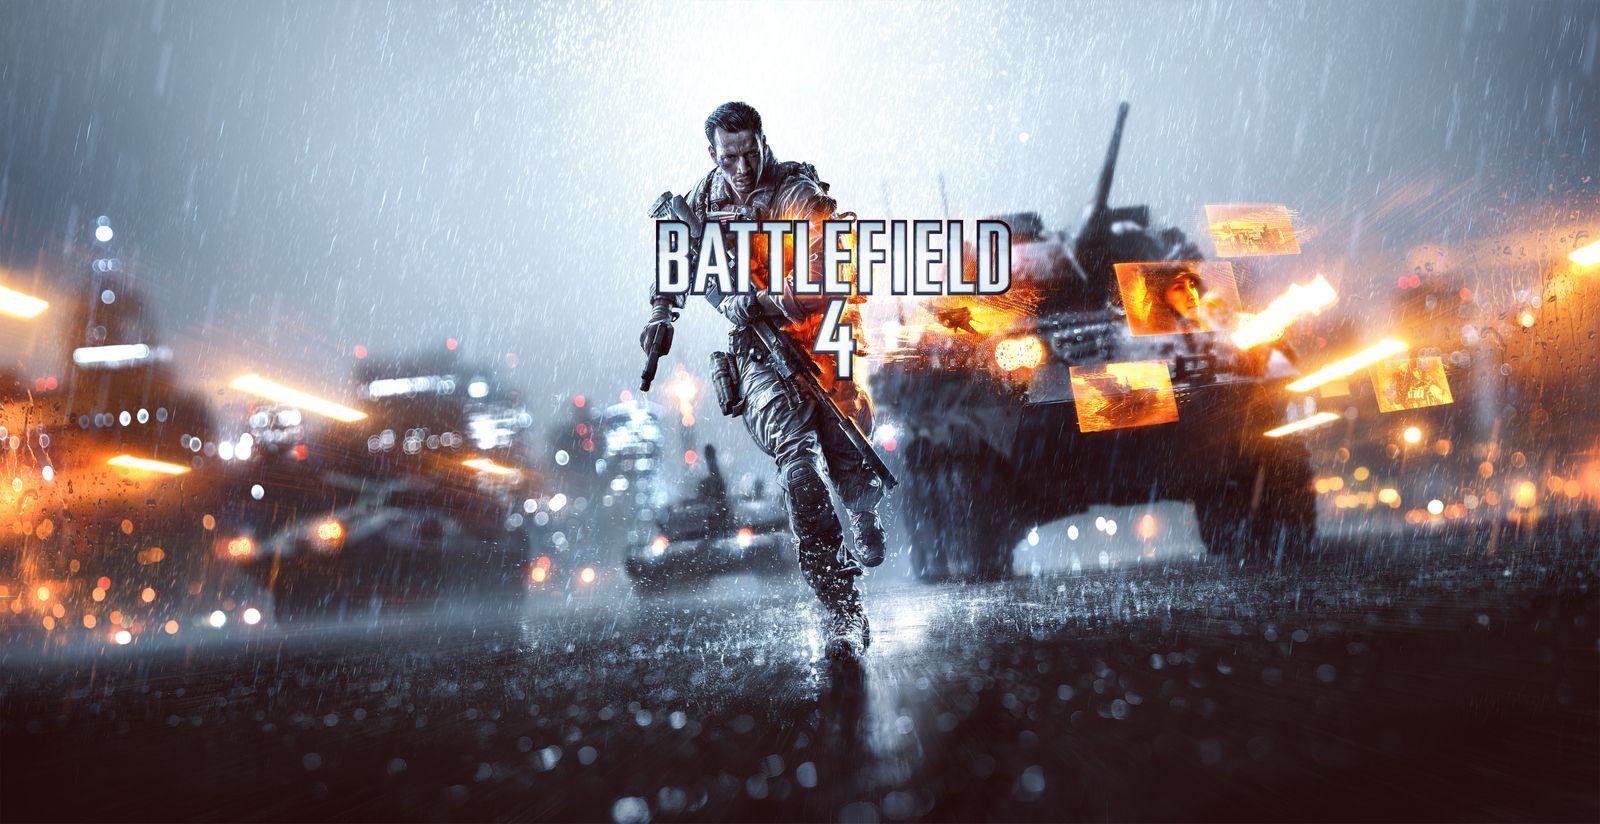 Un gameplay de Battlefield 4